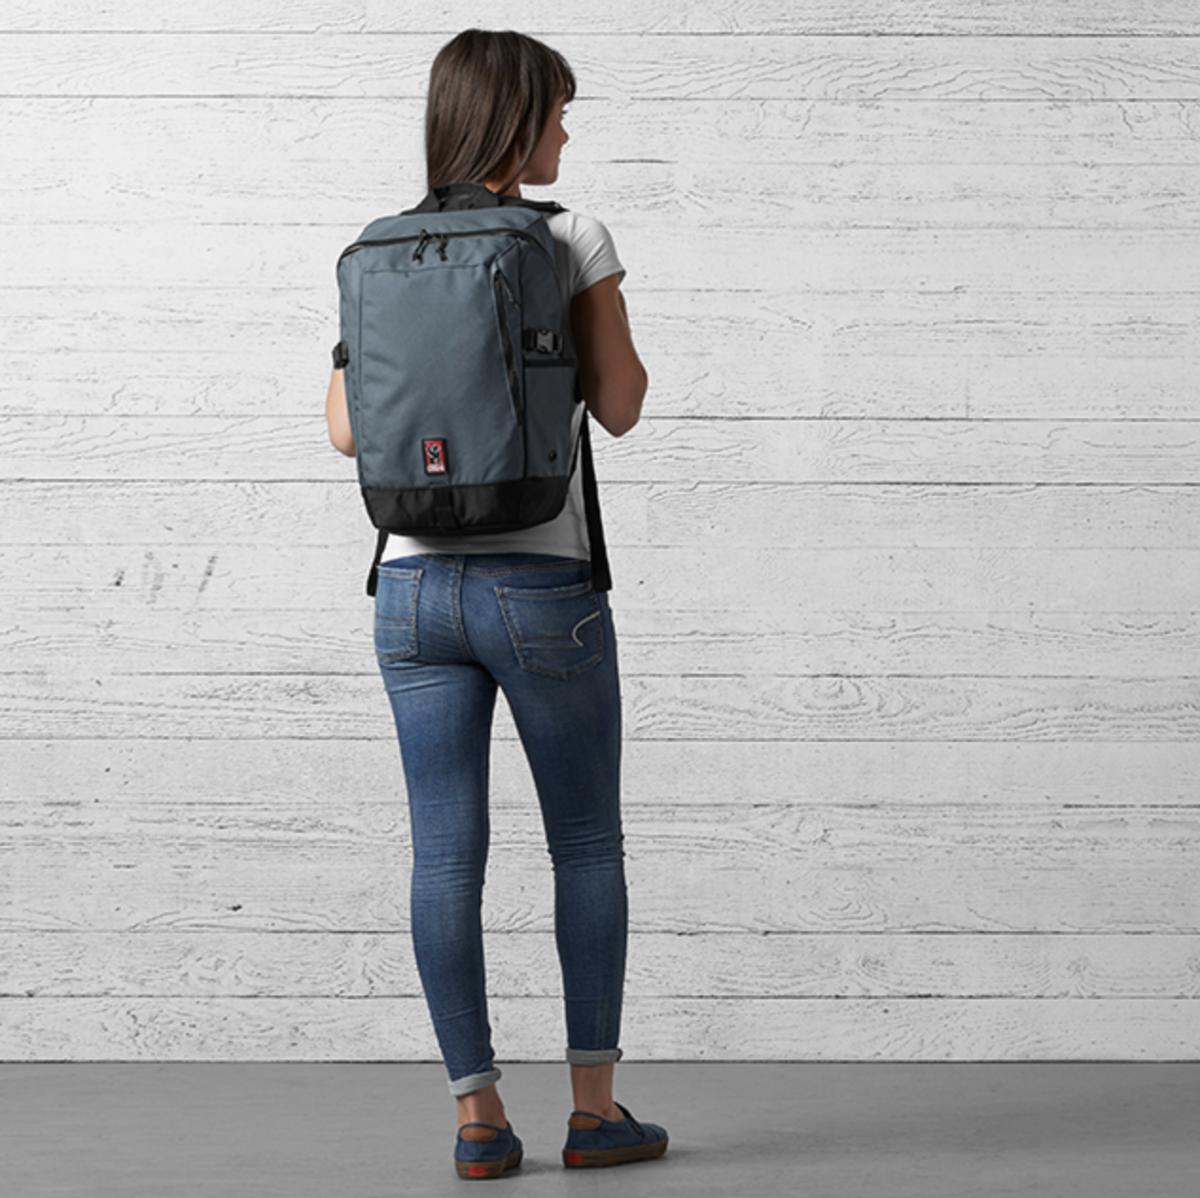 f:id:thebackpack:20190522201417p:plain